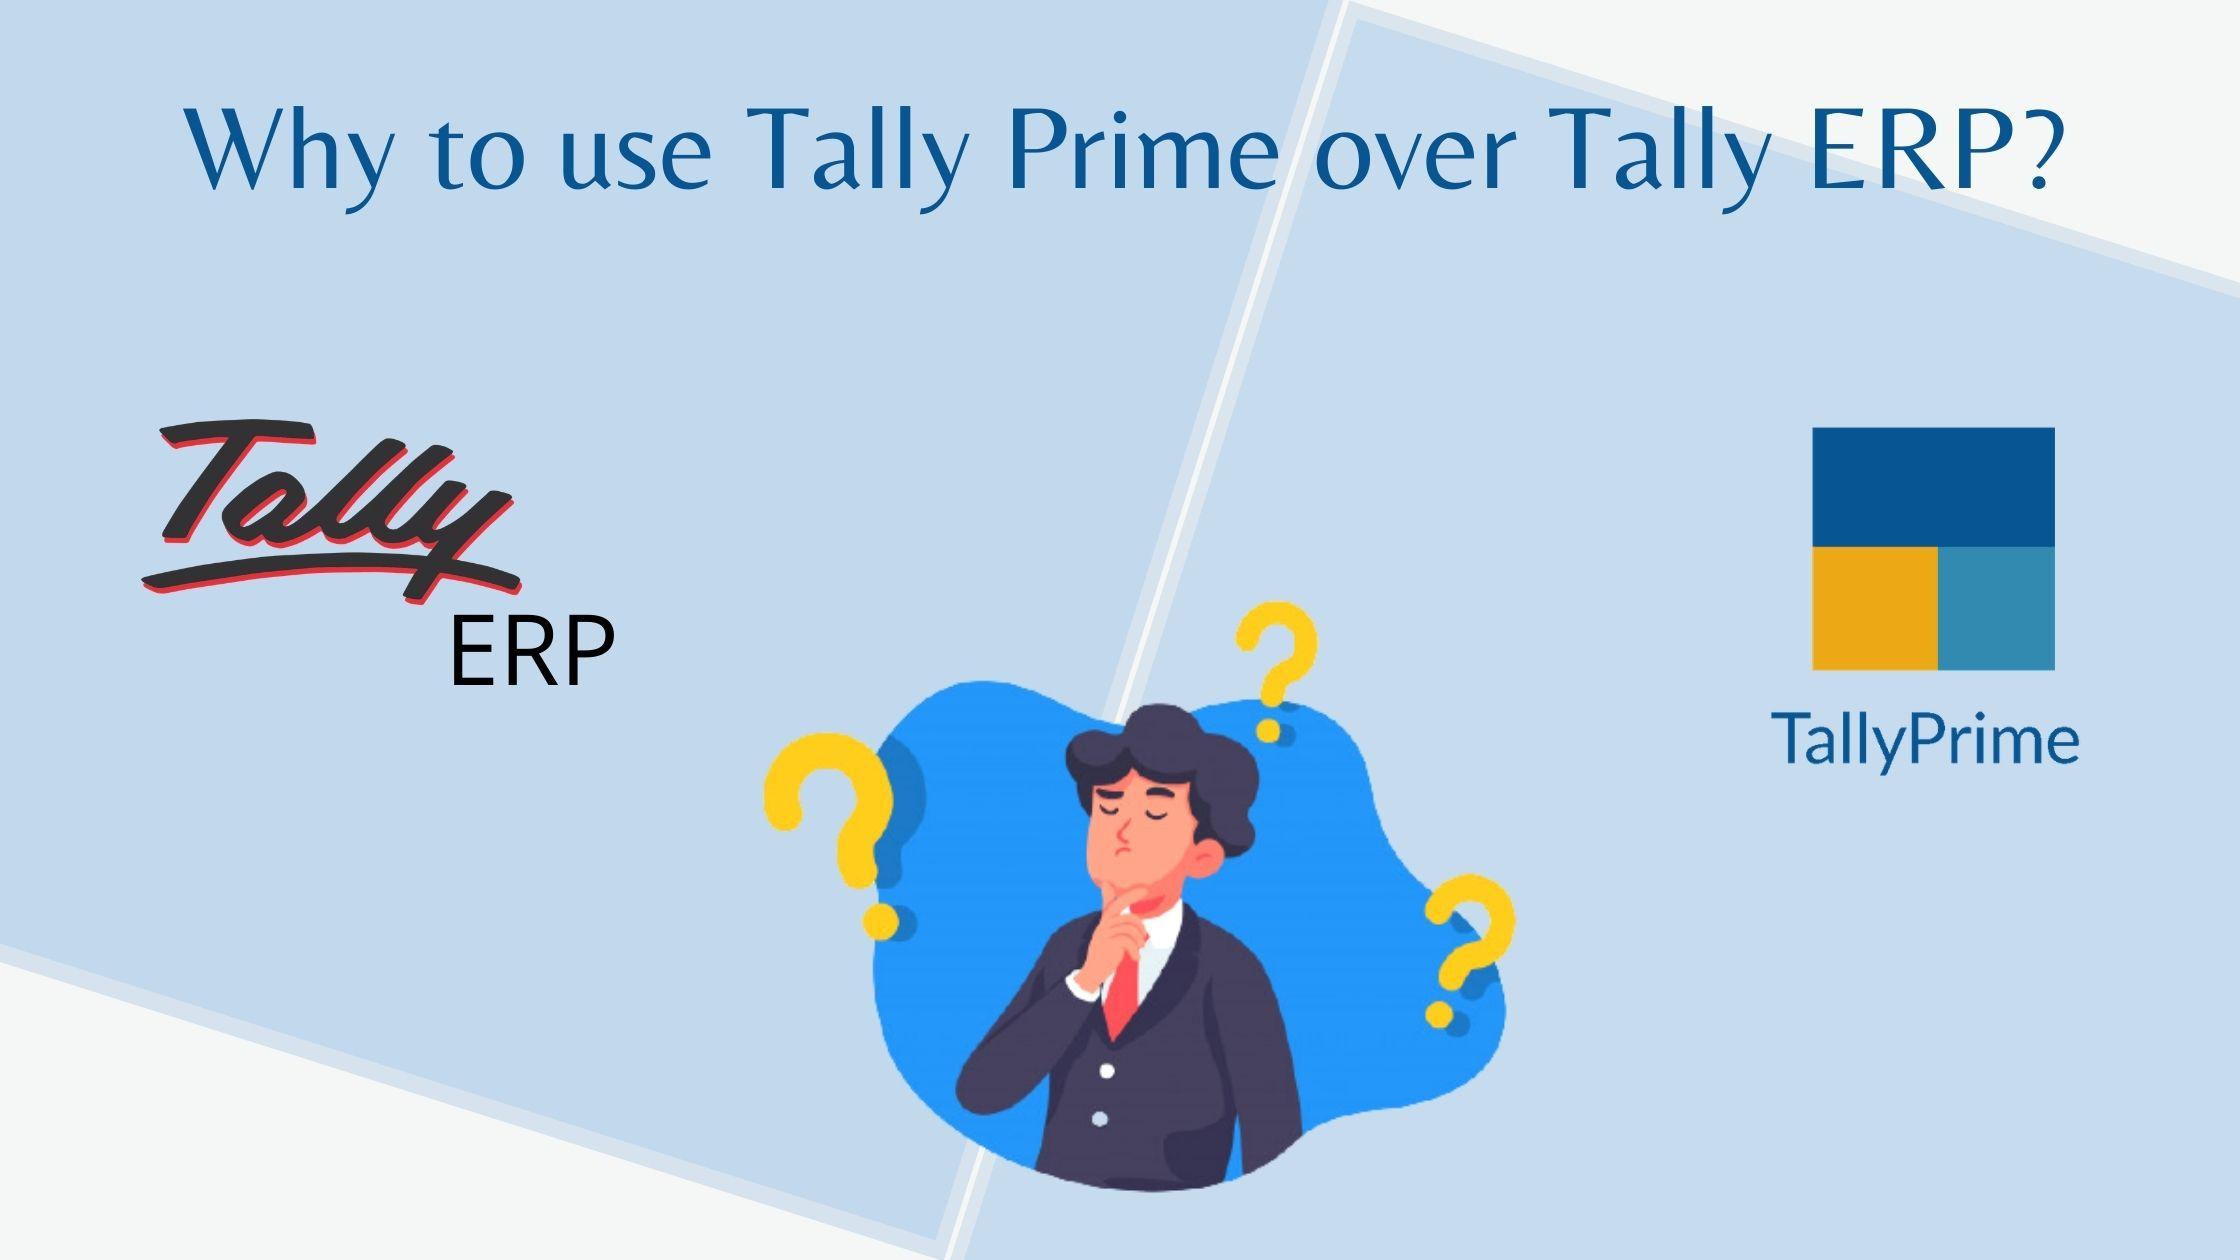 Tally Prime vs Tally erp